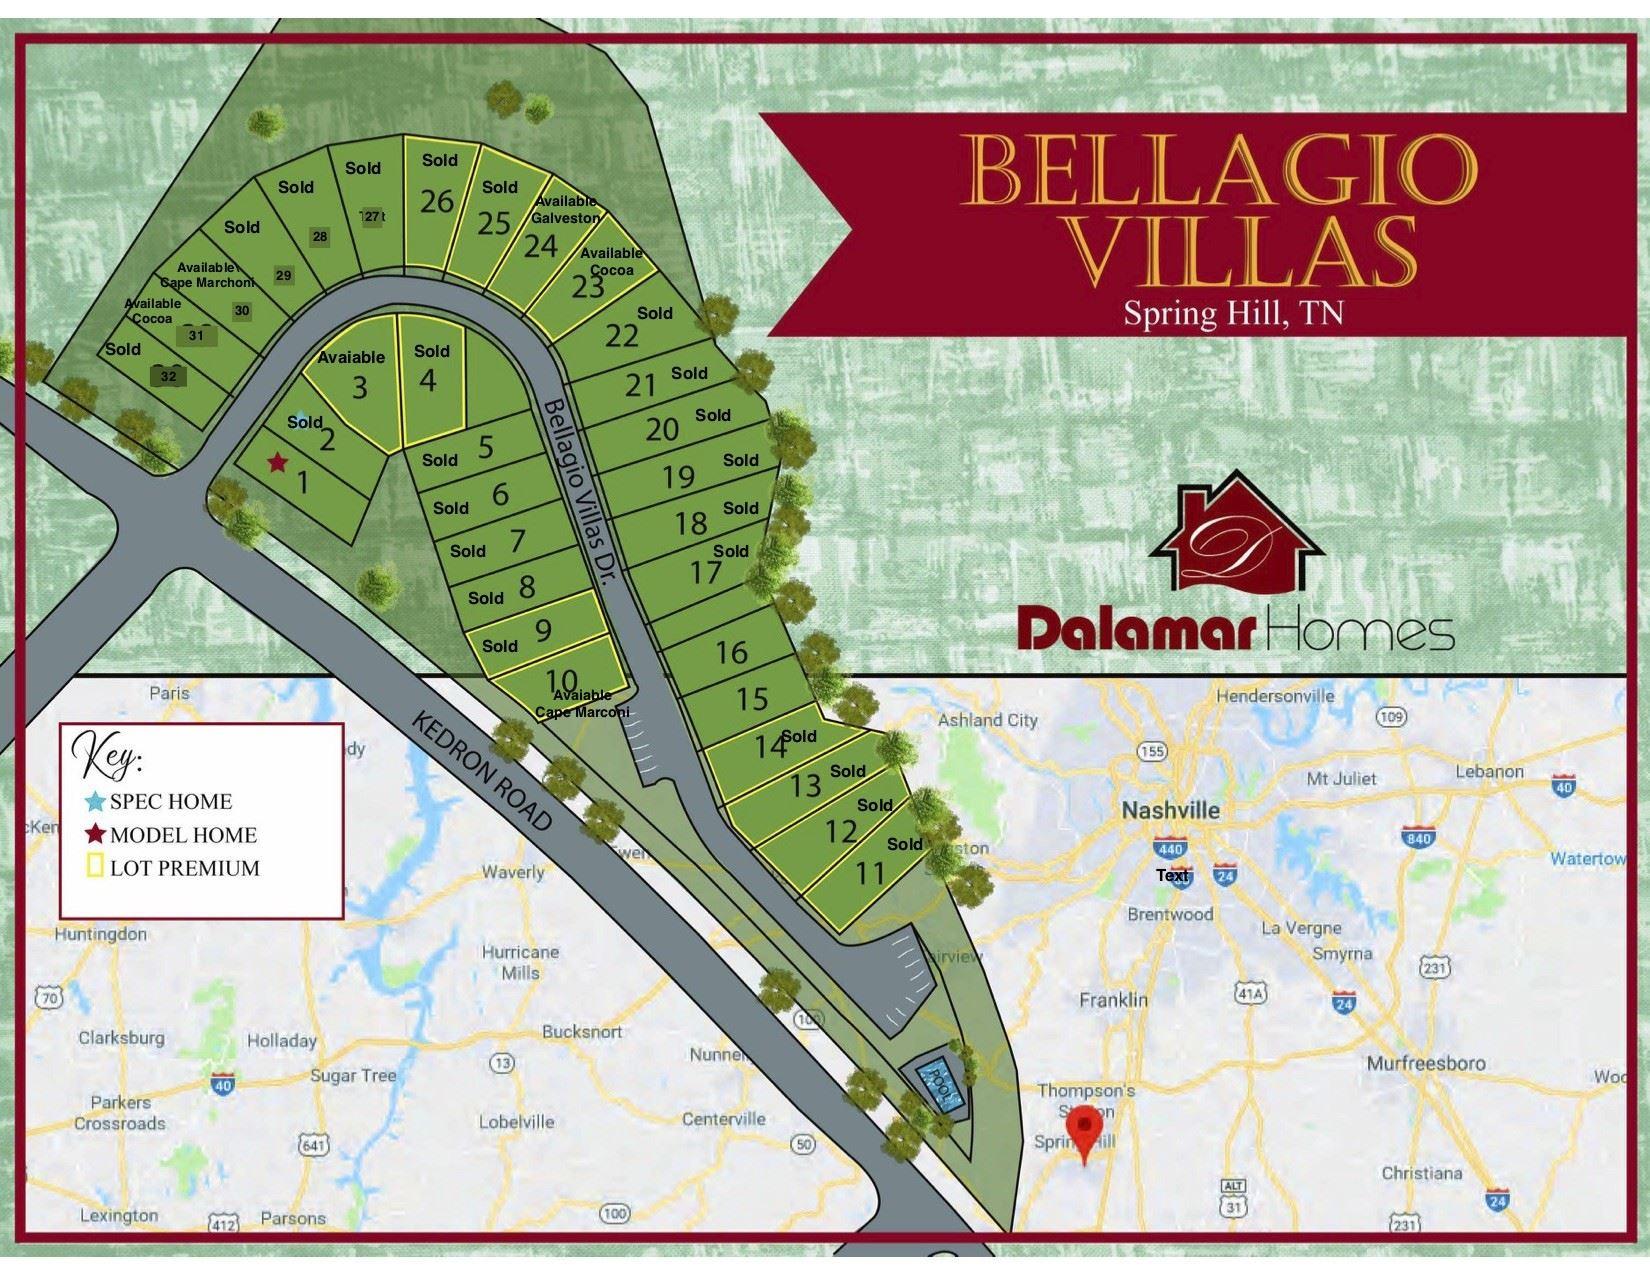 Photo of 119 Bellagio Villas DR, Spring Hill, TN 37174 (MLS # 2212849)